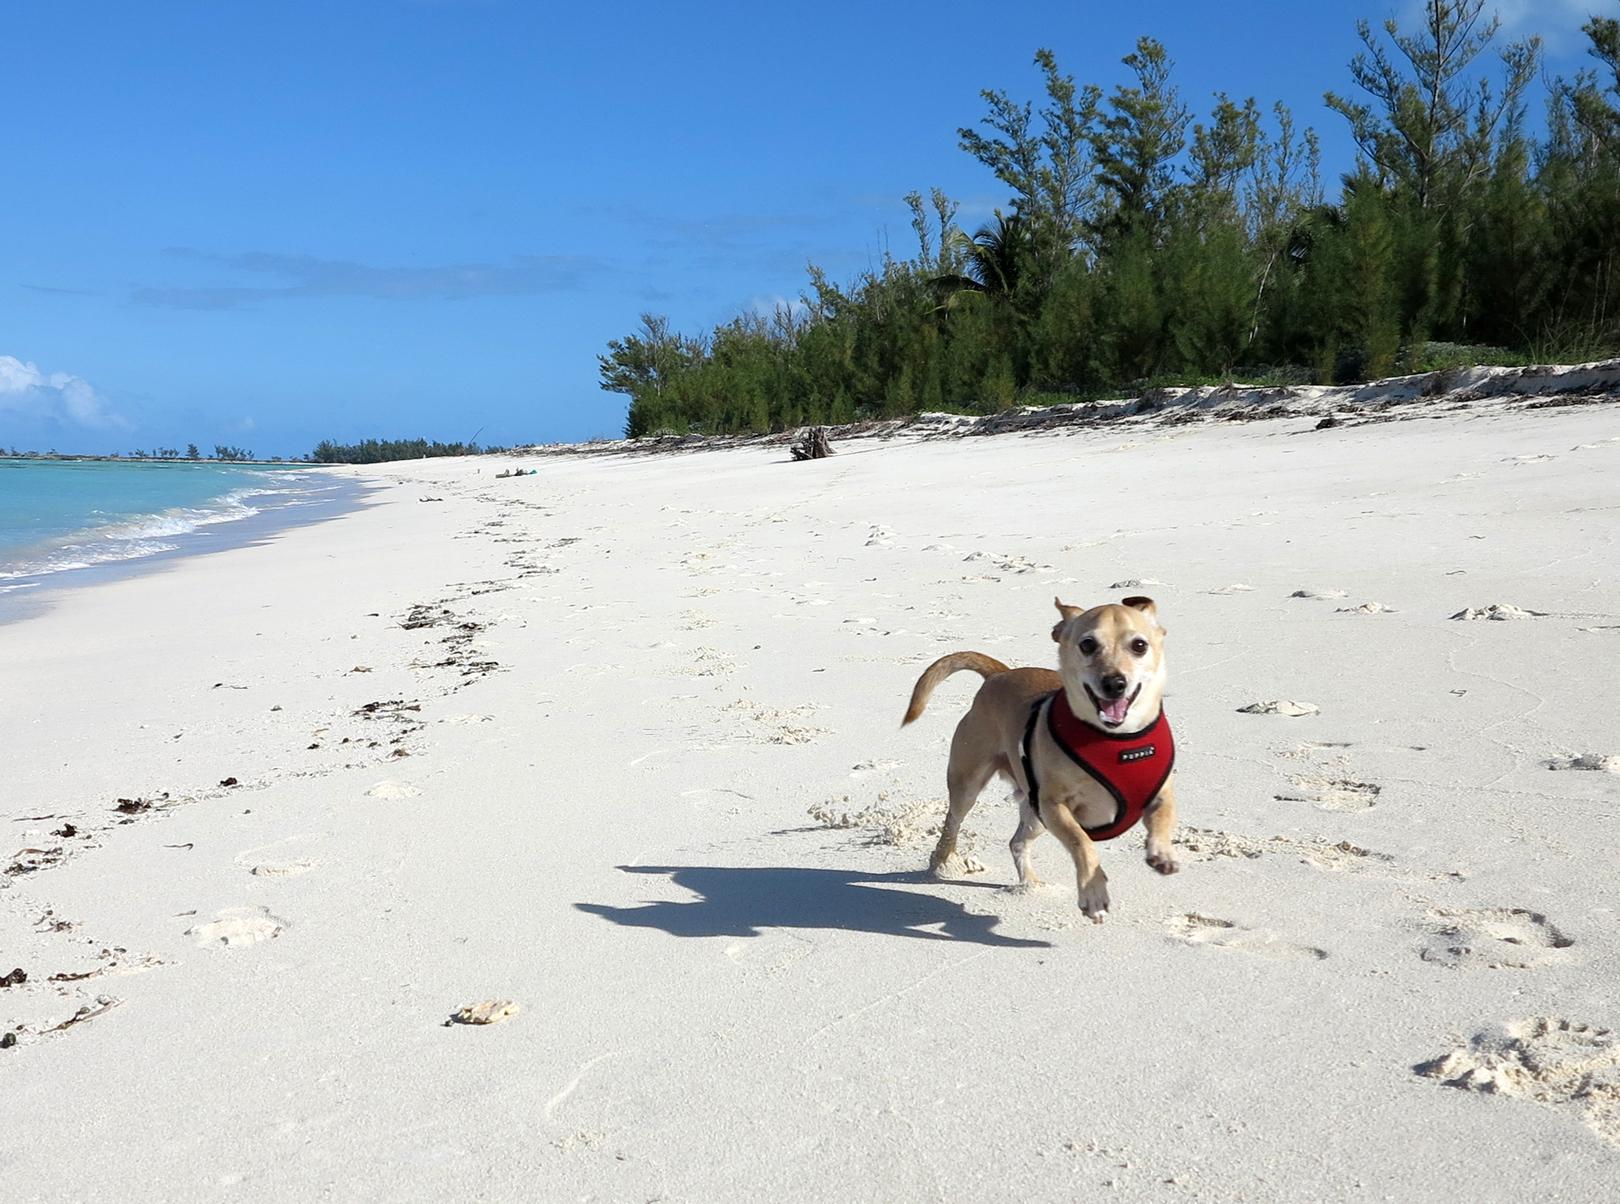 Happy dog at Gillam Bay, Green Turtle Cay, Abaco, Bahamas